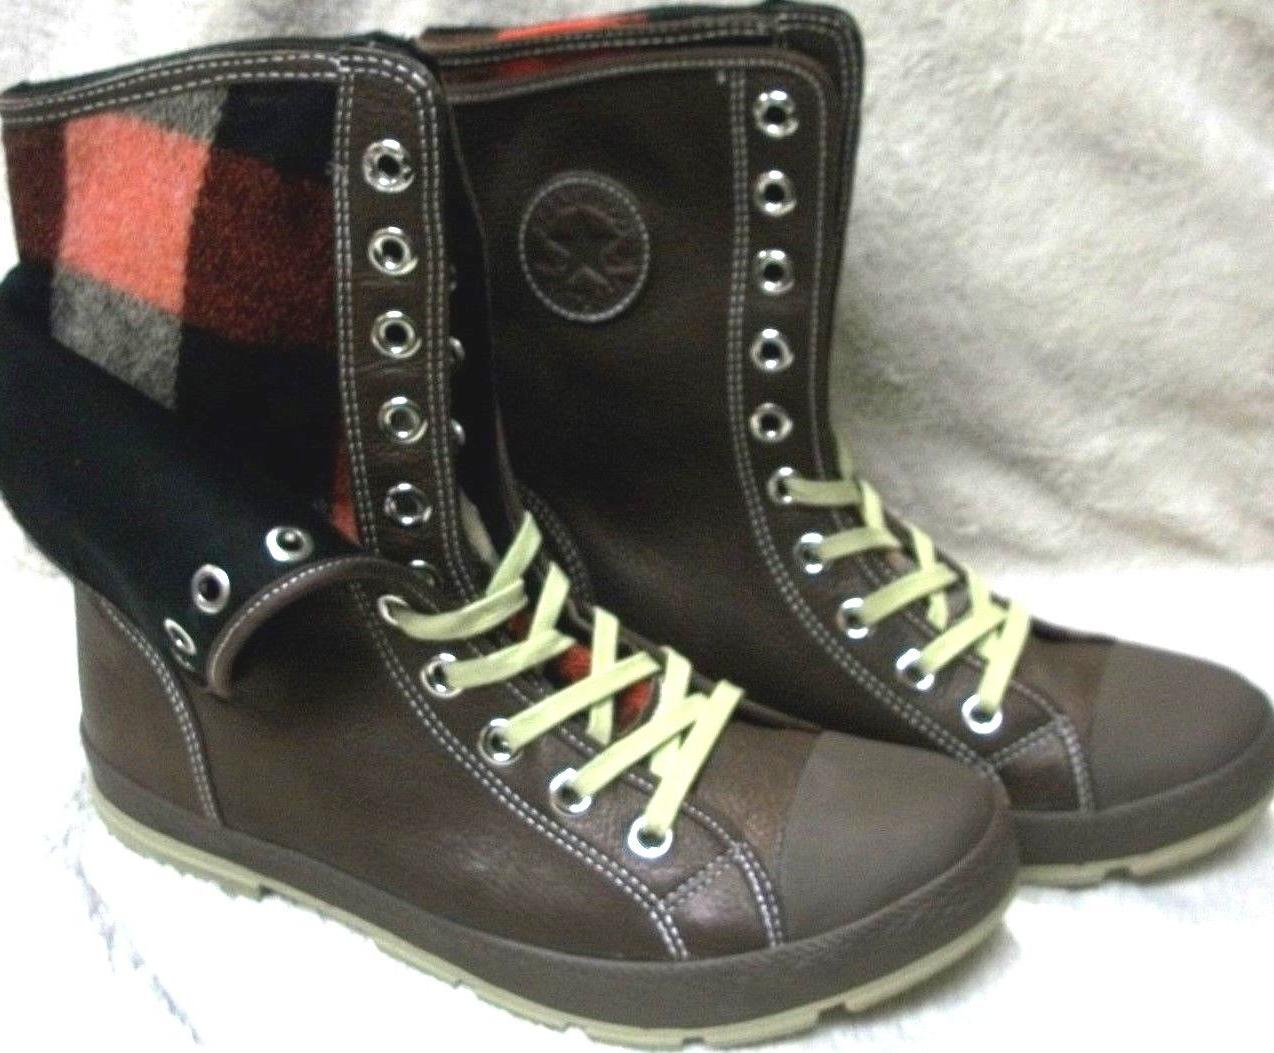 Converse 117657 CT Storm Boot Woolrich XHI Men's 10.5 - Wome